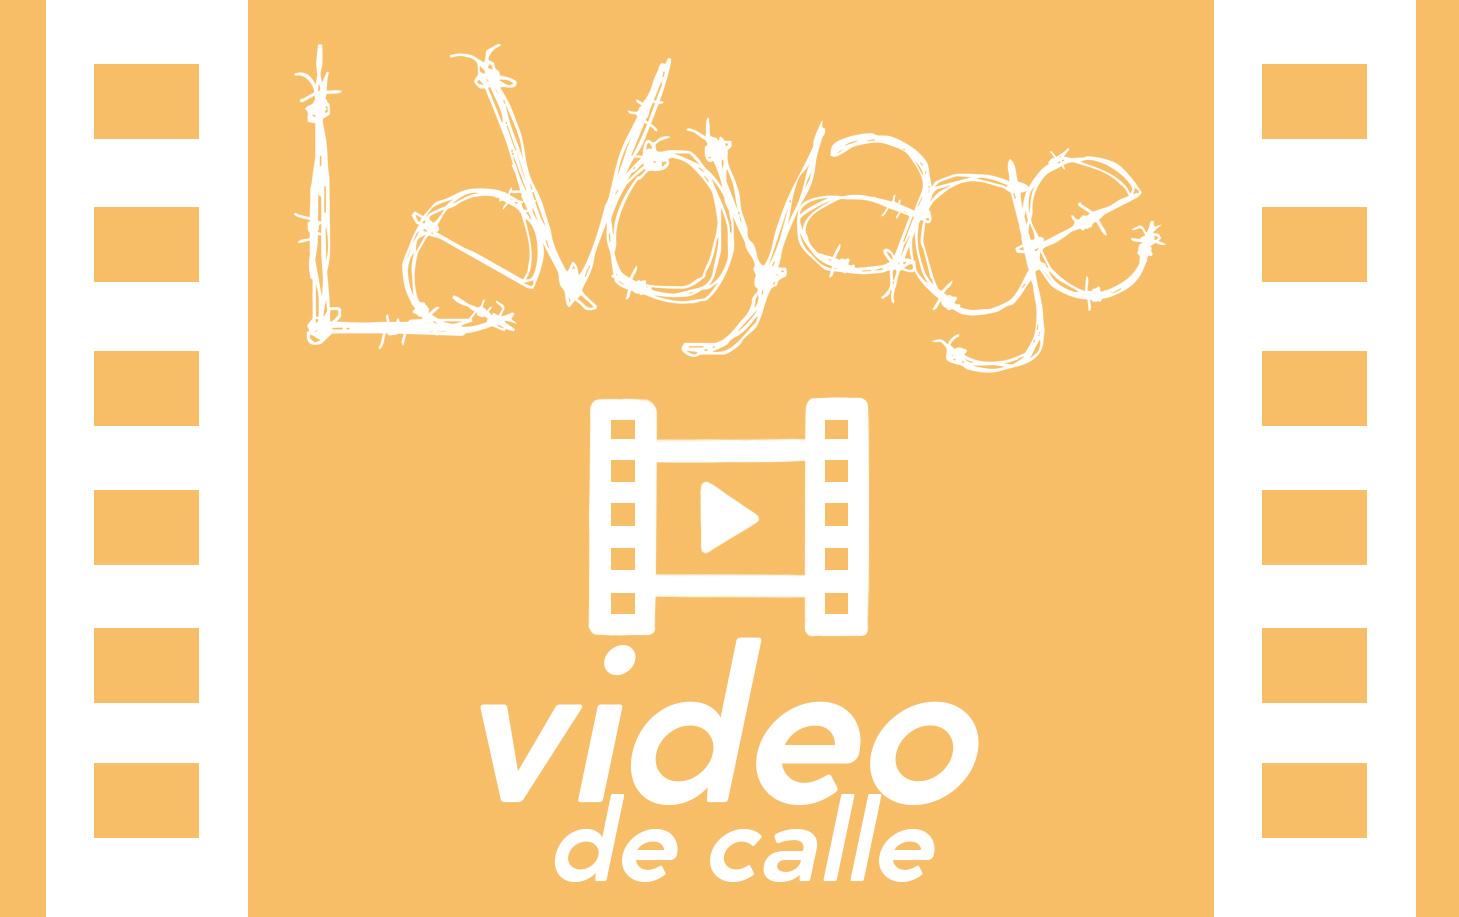 VIDEO LEVOYAGE de calle